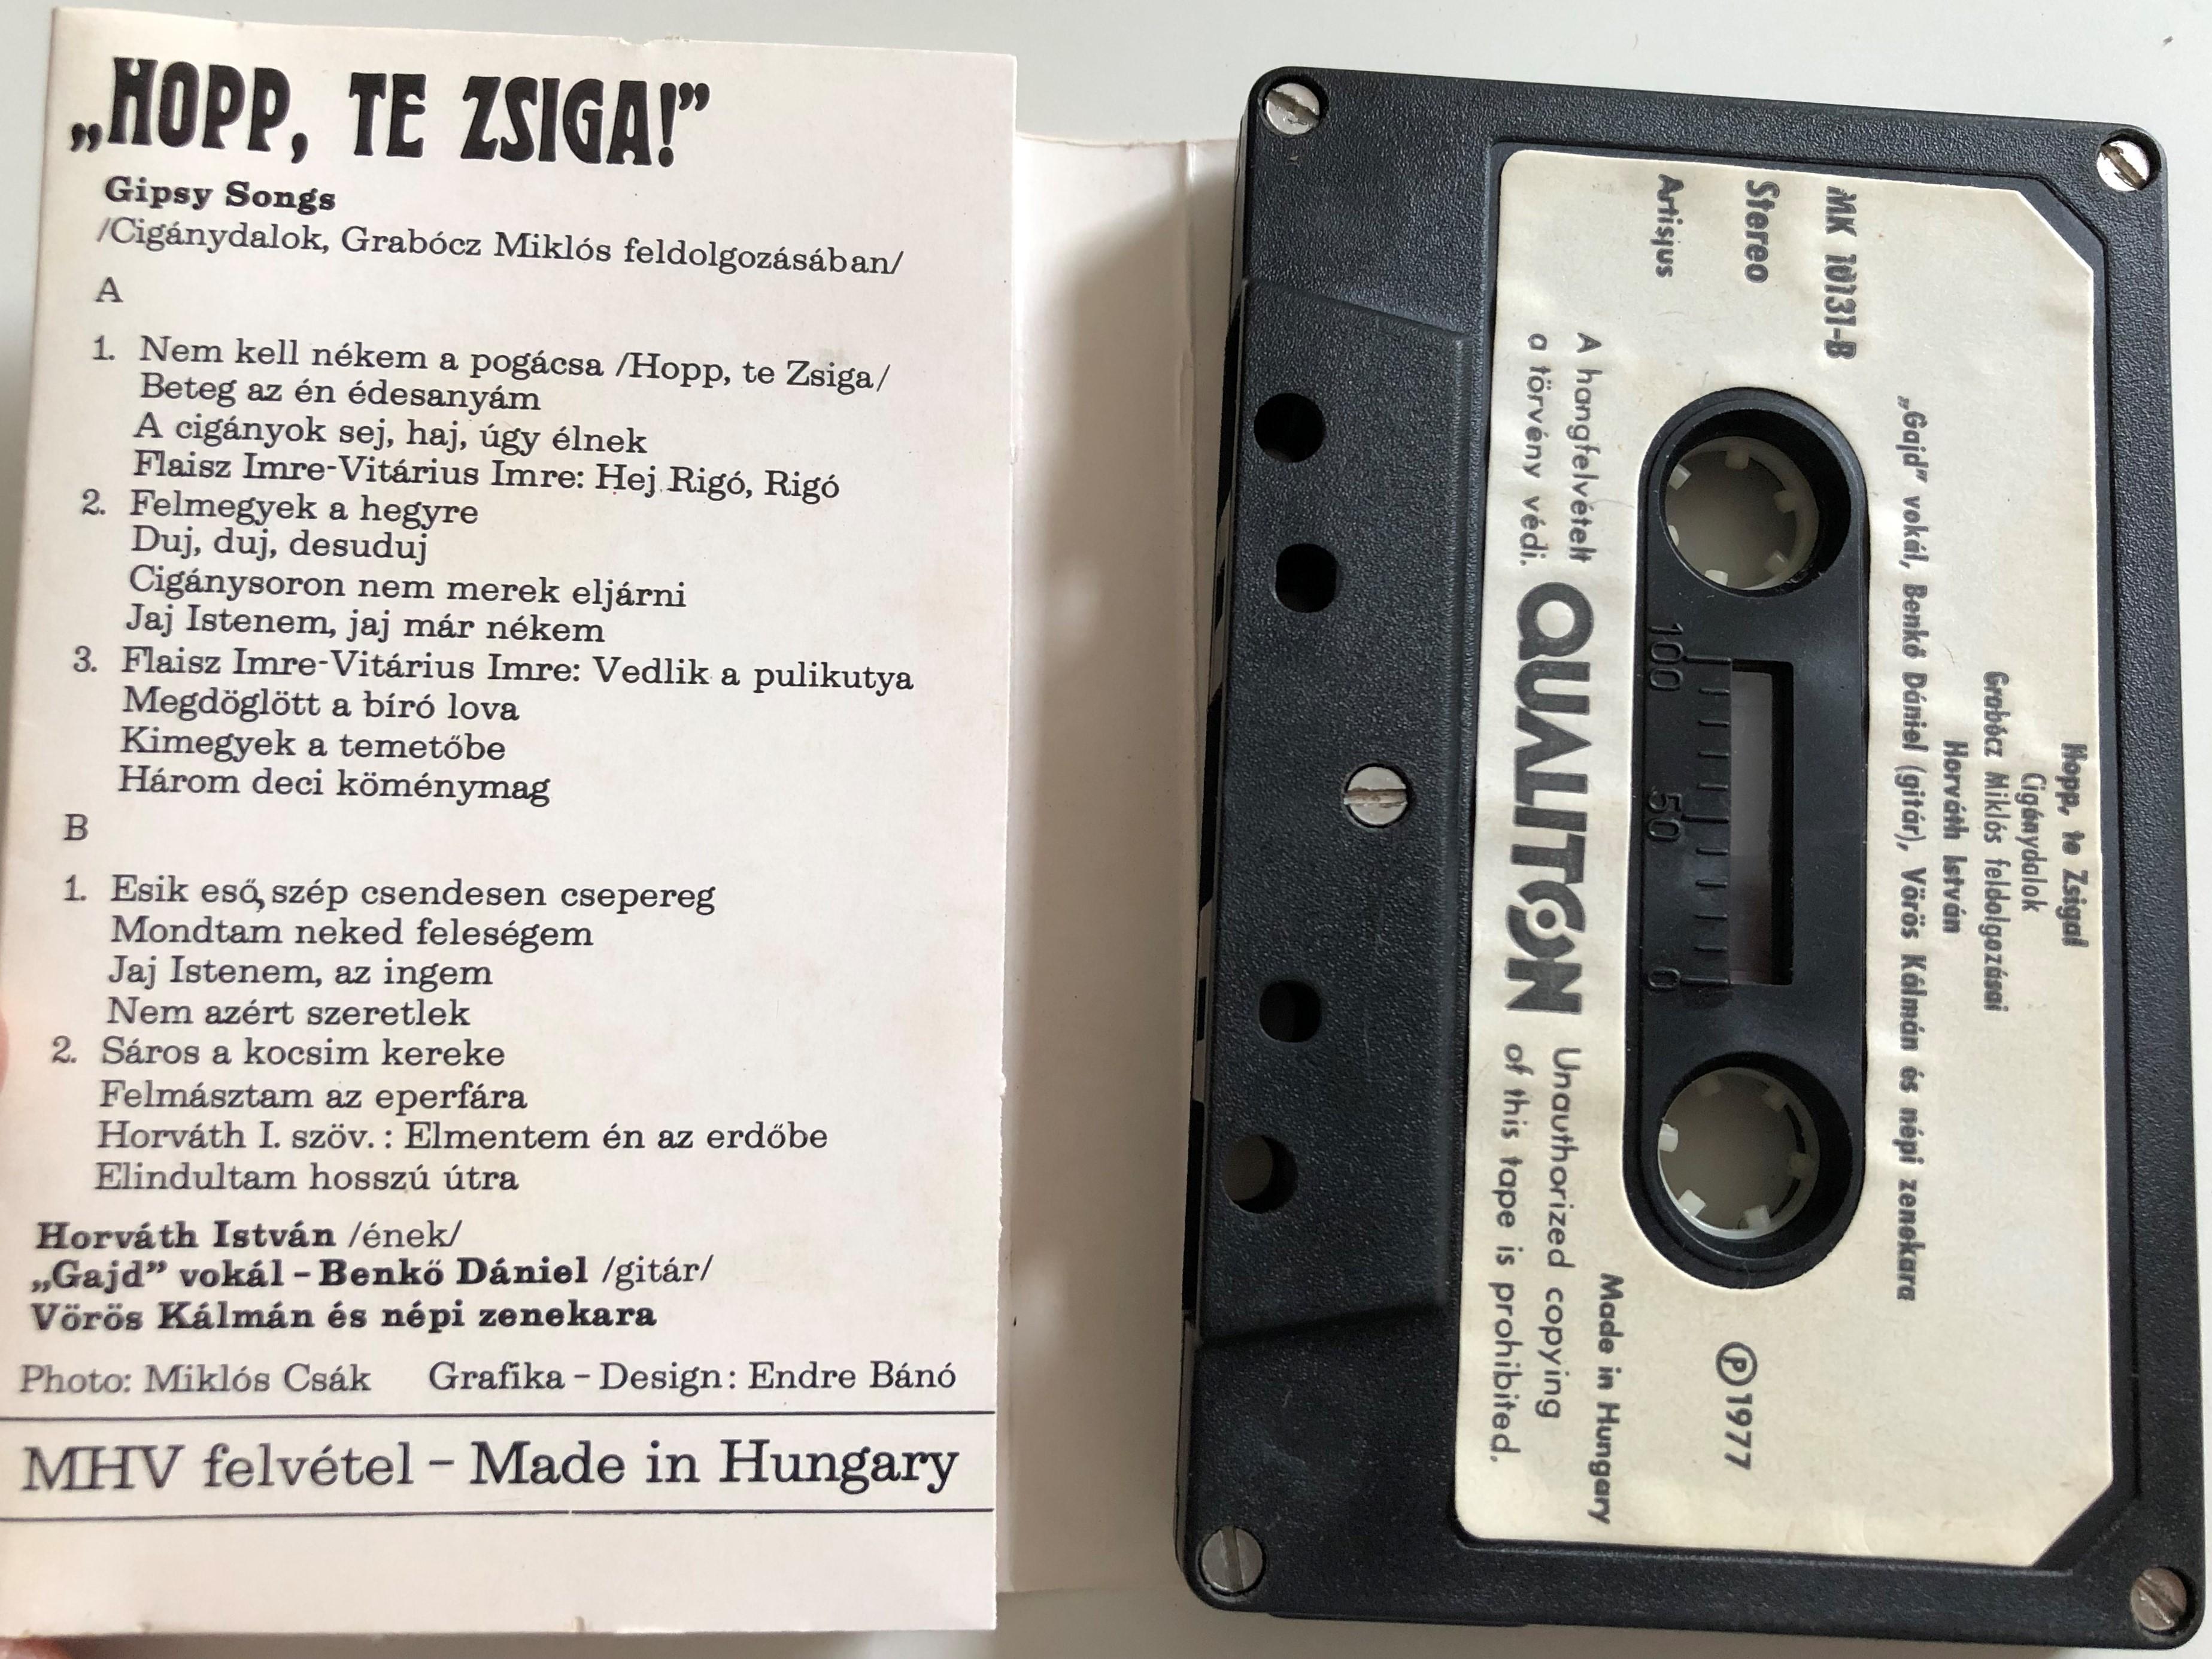 hopp-te-zsiga-gipsy-songs-horv-th-istv-n-gajd-vokal-benko-daniel-voros-kalman-es-nepi-zenekara-qualiton-cassette-stereo-mk-10131-2-.jpg